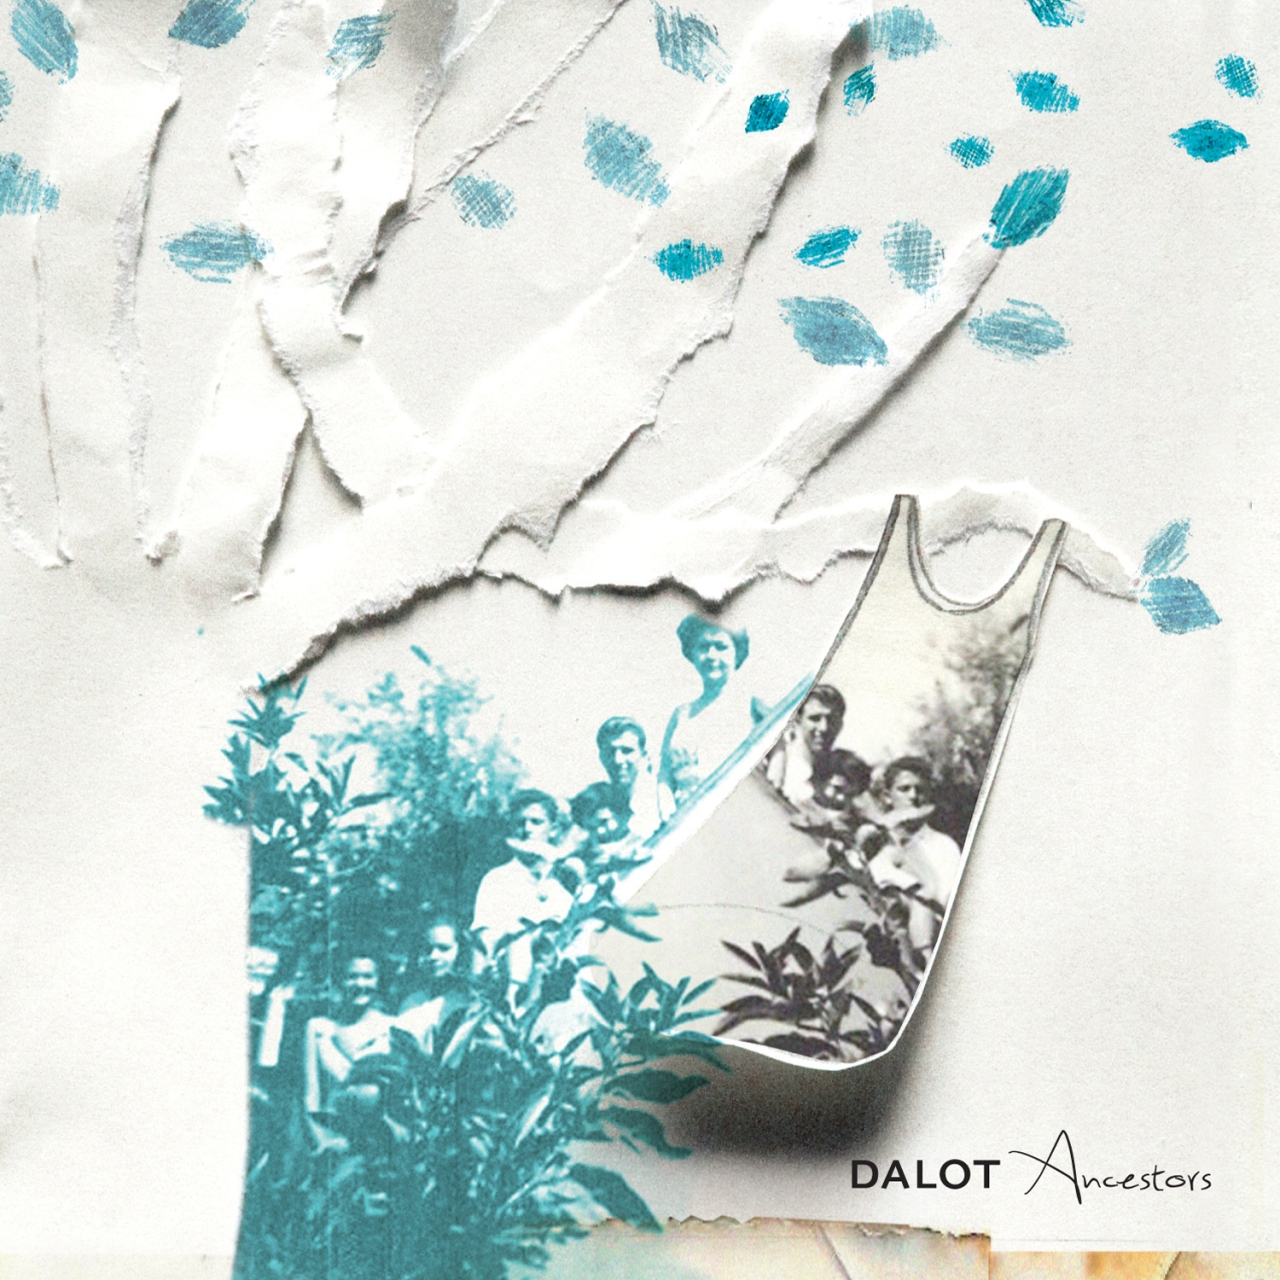 Dalot ~ Ancestors / Dalot & Gavin Miller ~Wards